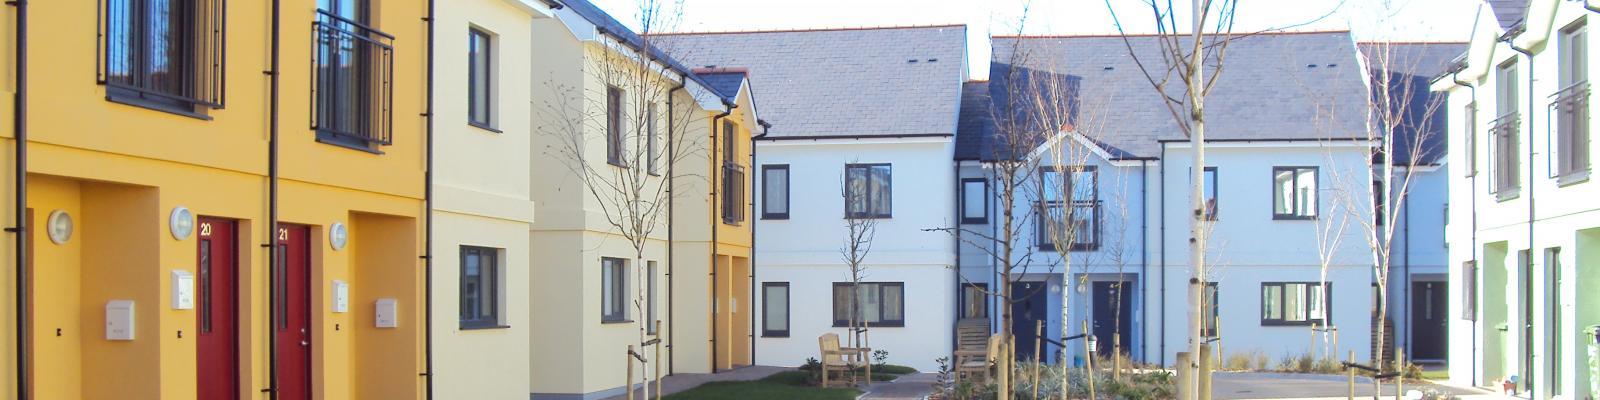 Single social housing waiting list goes live — GHA